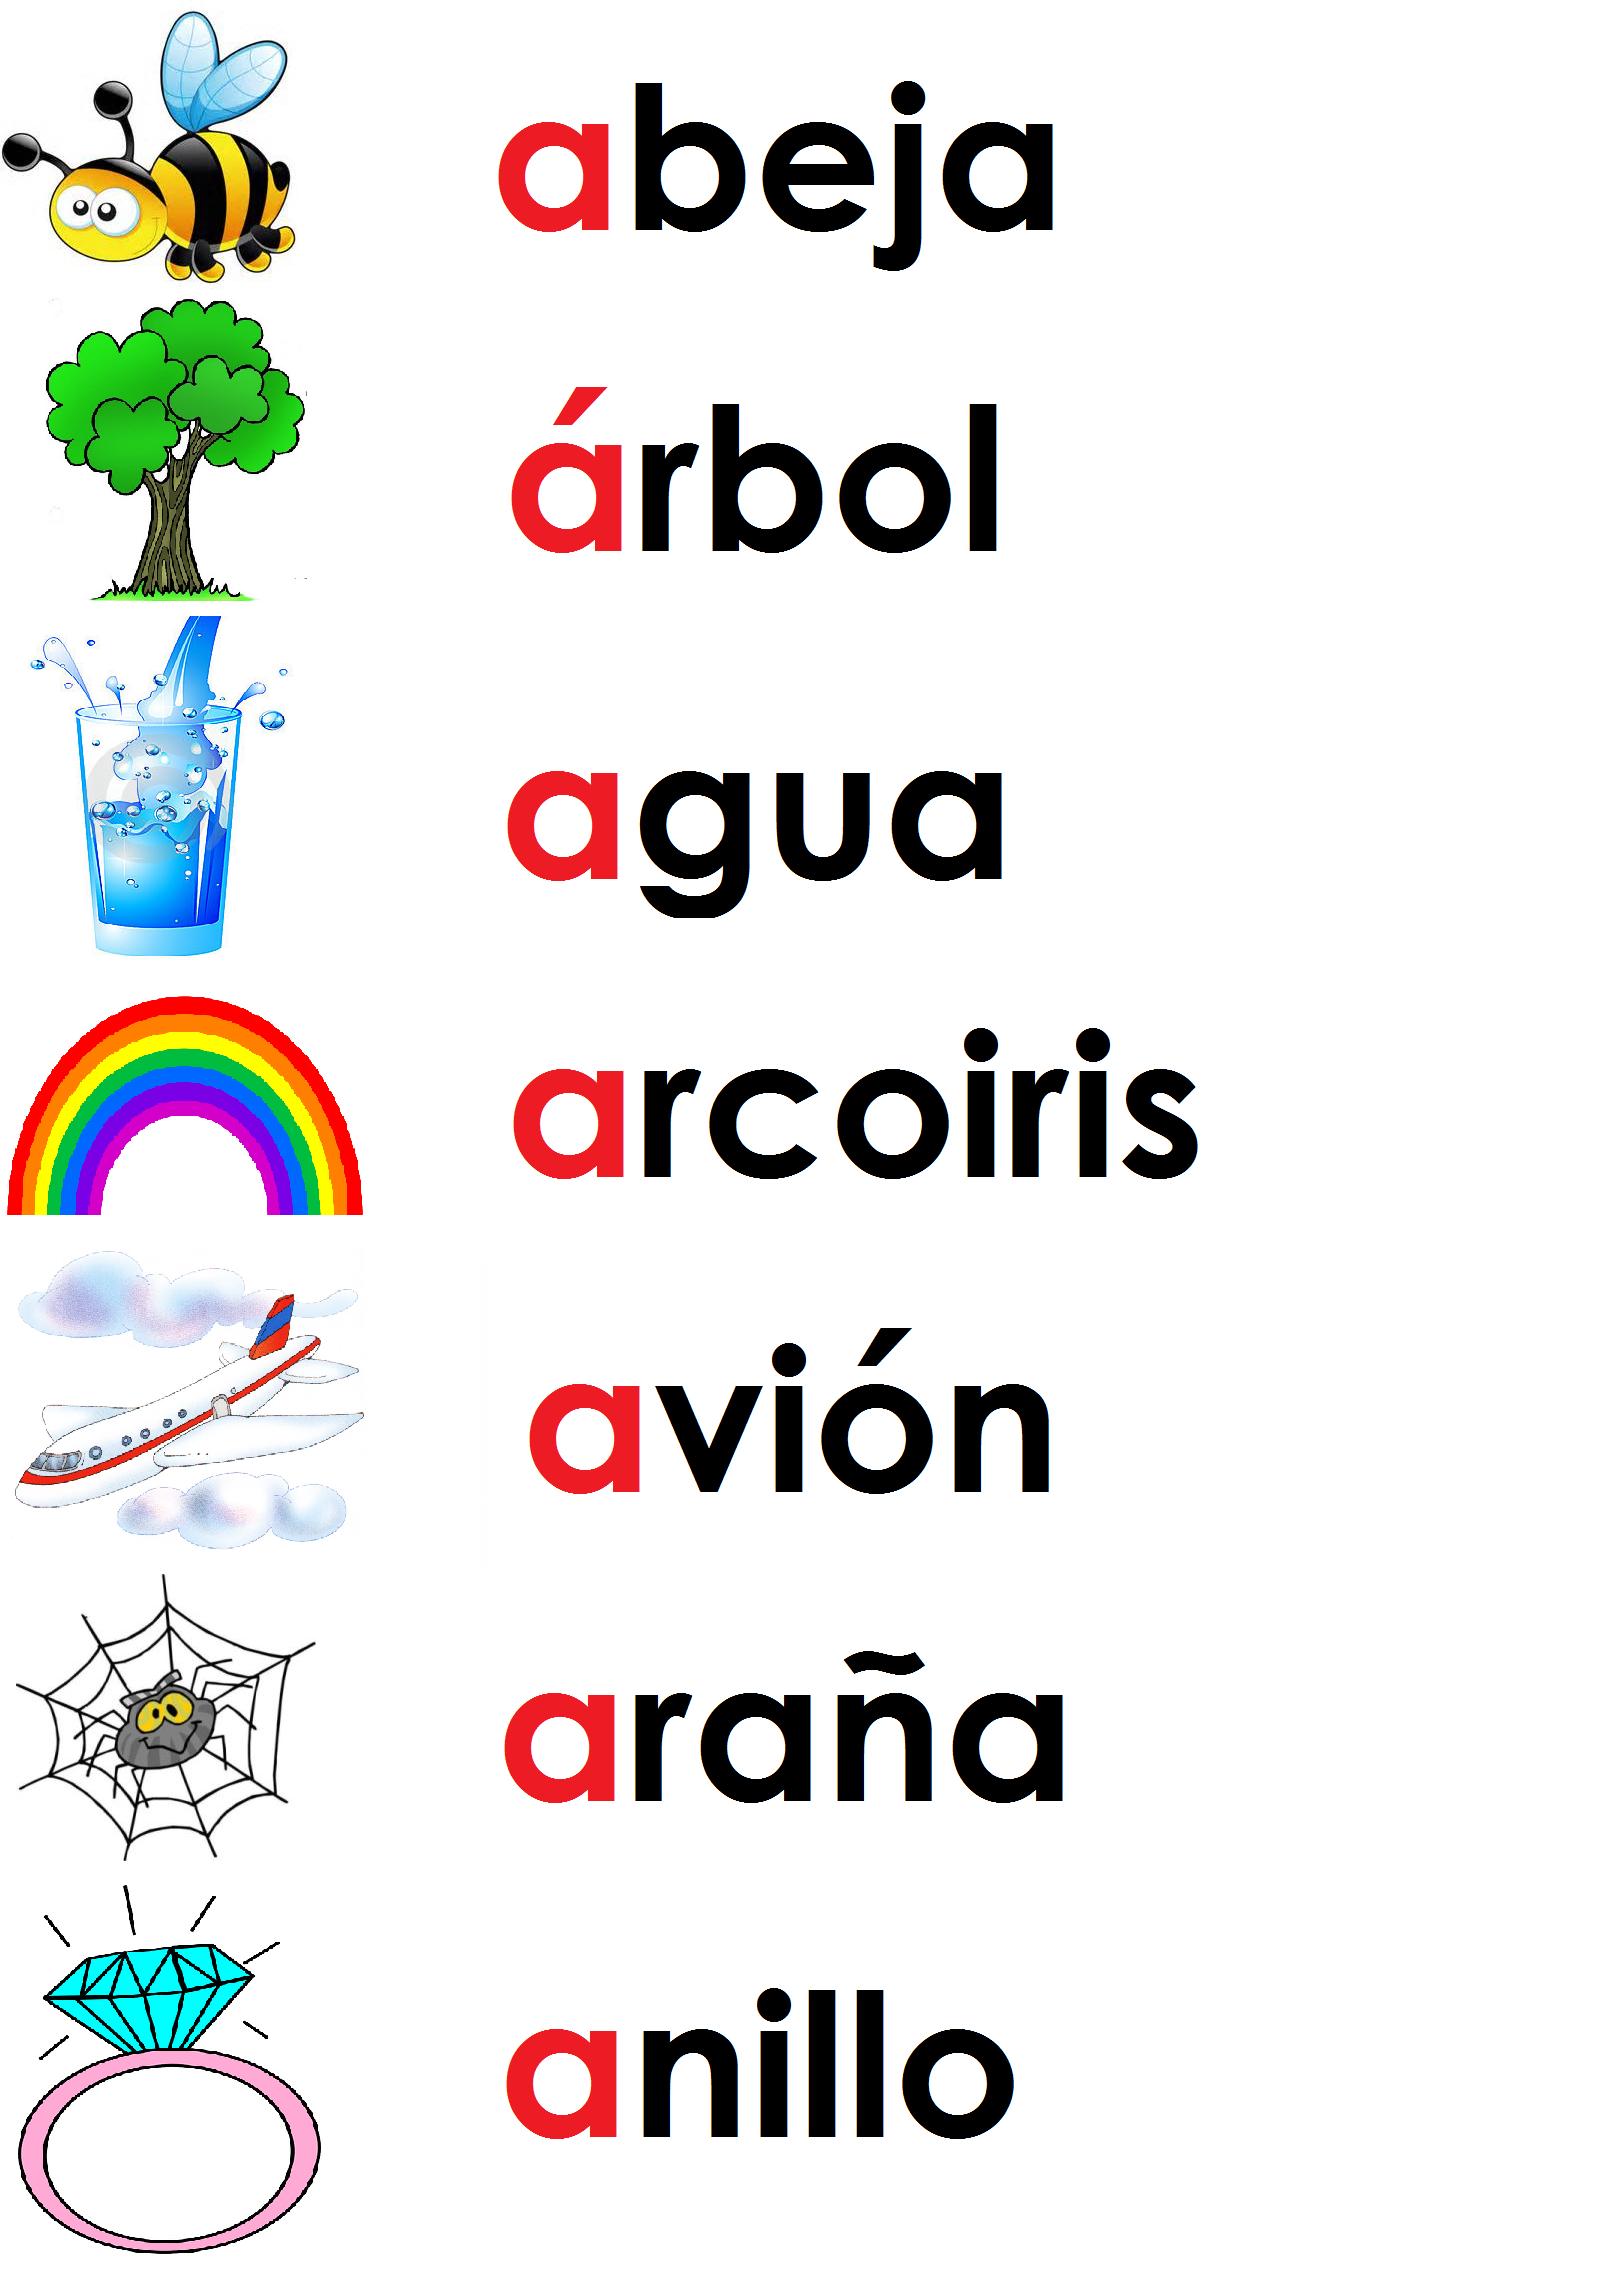 Vocabulario Letra Aa Palabras Con Dibujos Relacion Metodo Global Preescolar Ensenanza De Las Letras Actividades De Letras Actividades De Lectura Preescolar